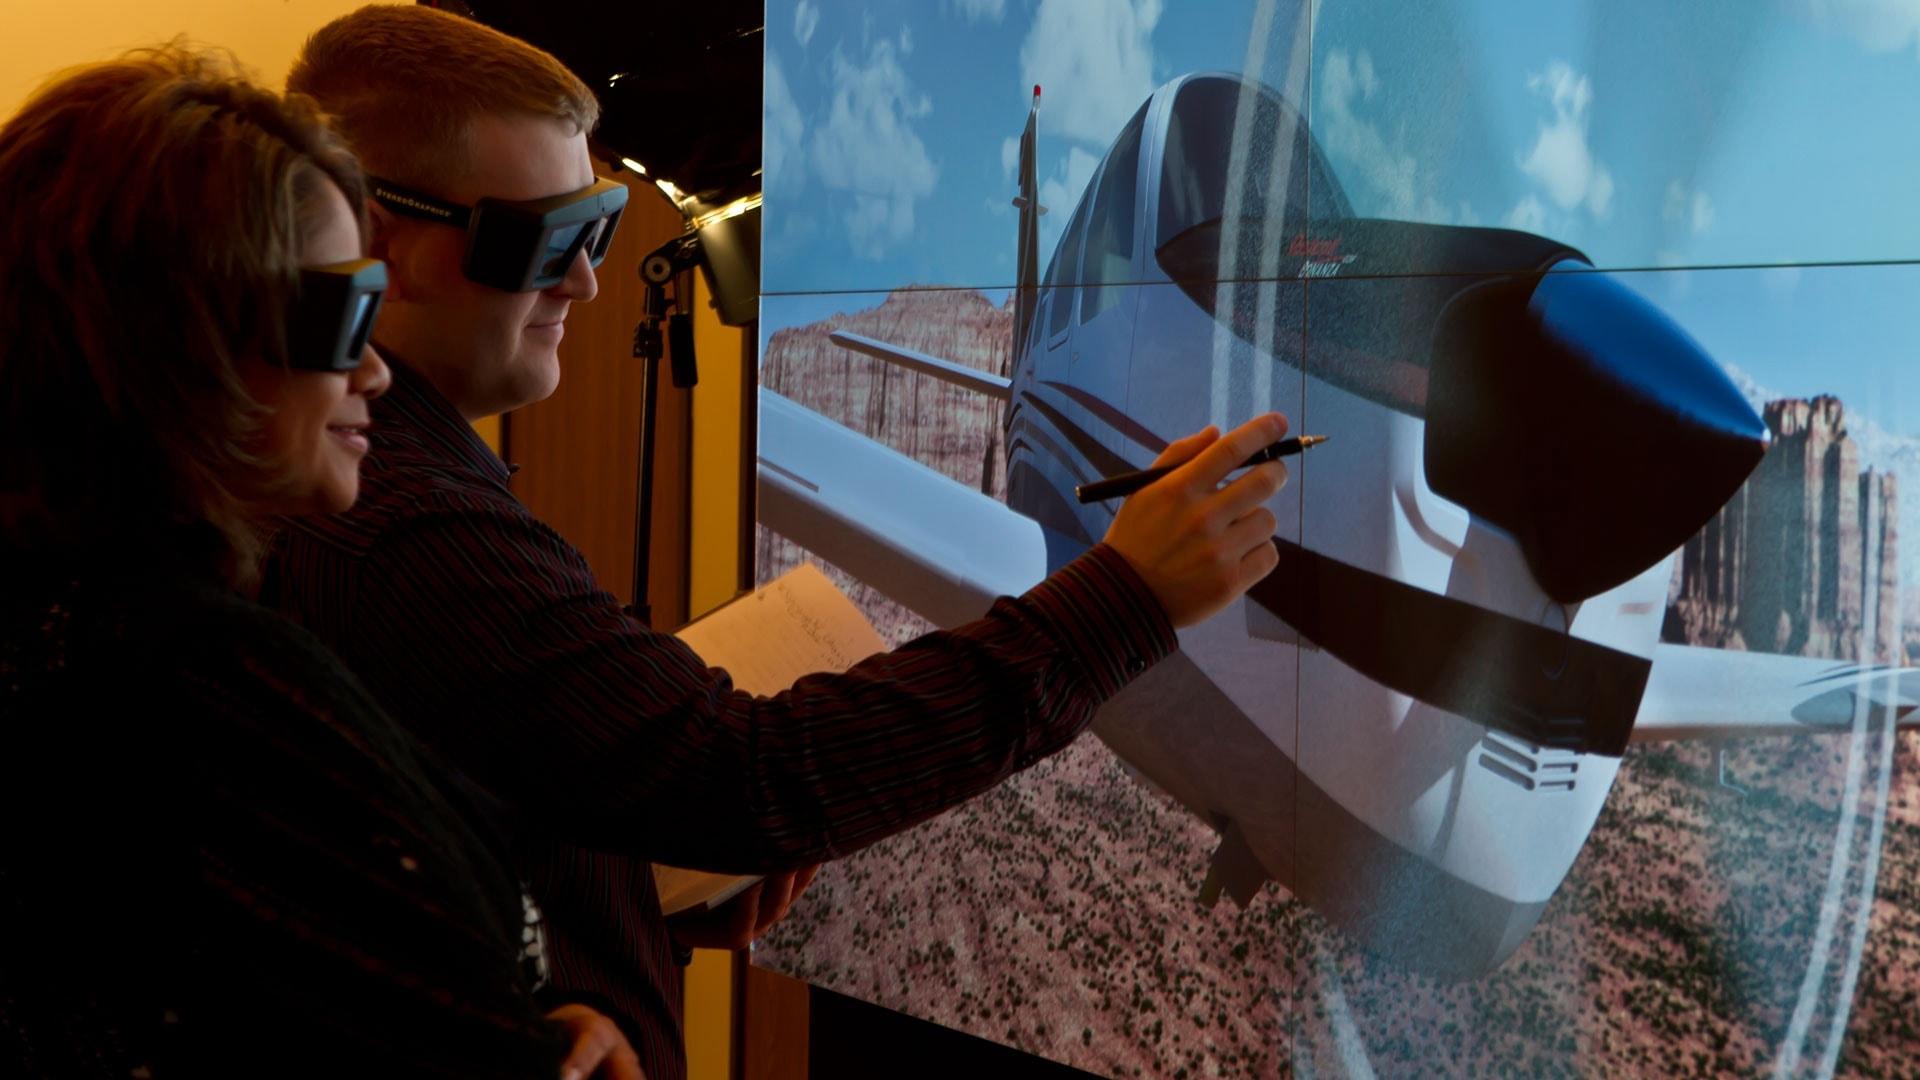 IGI 4K forum stereo glasses aerospace virtual reality